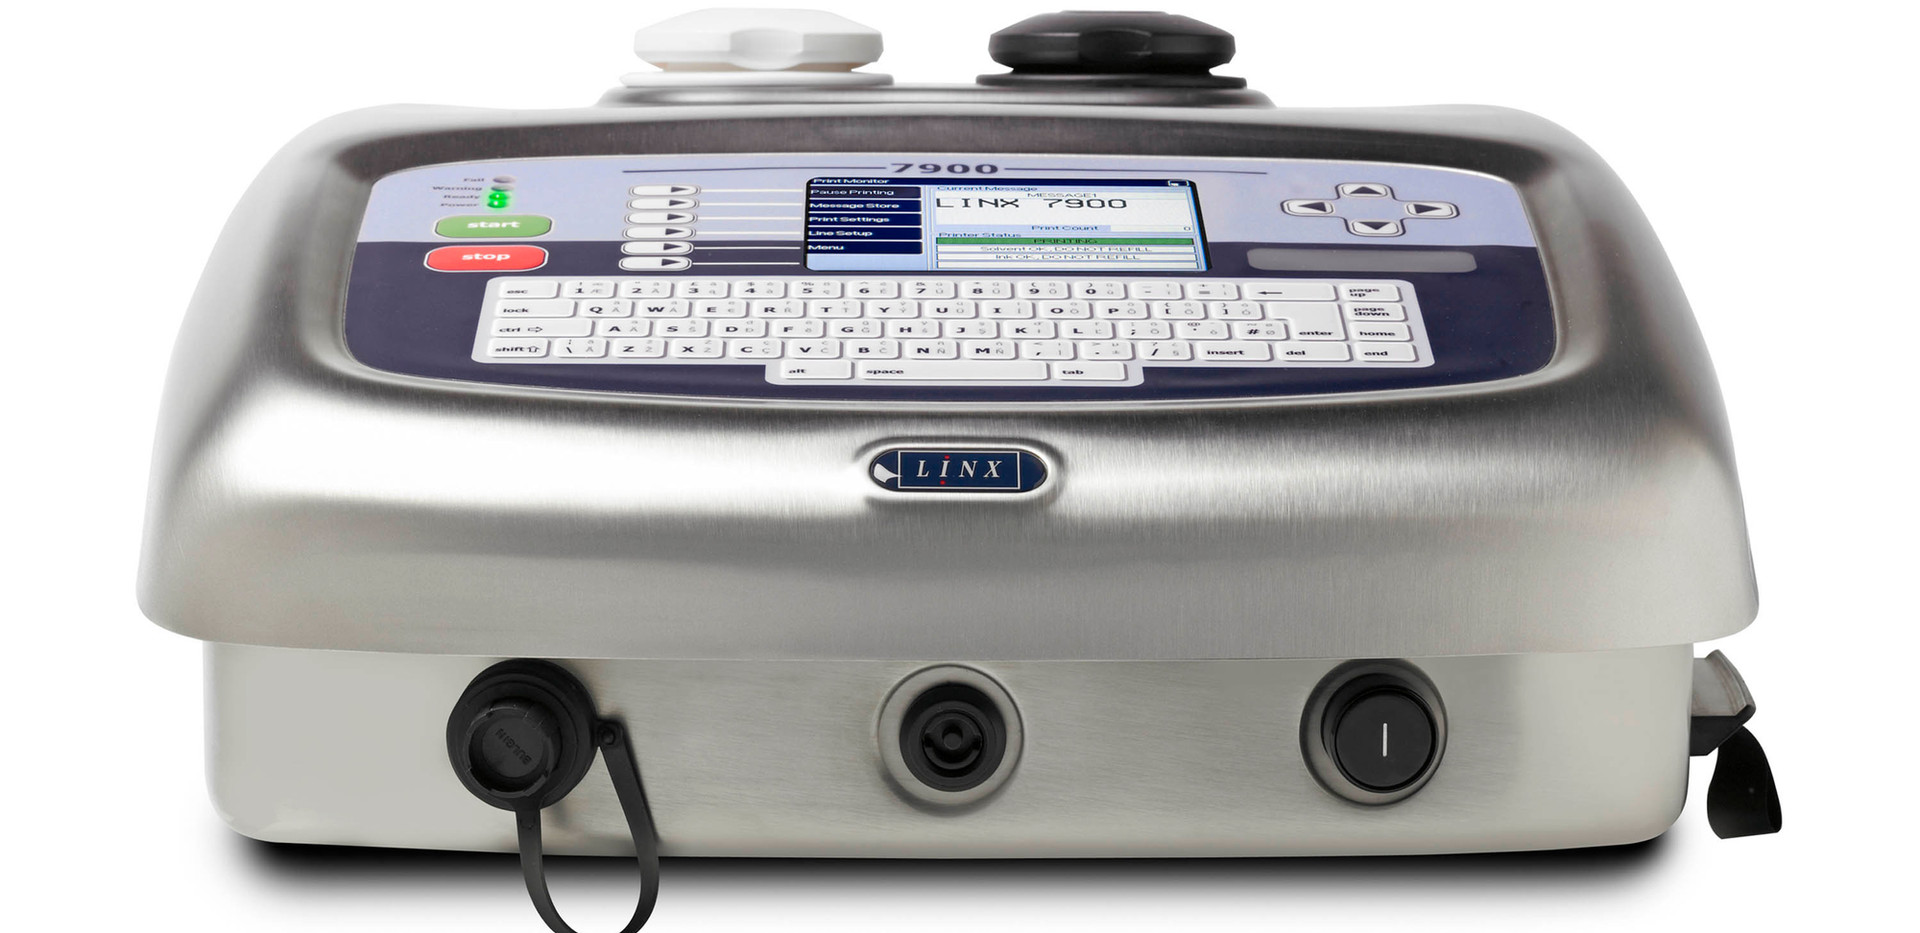 Linx 7900 CIJ Printer